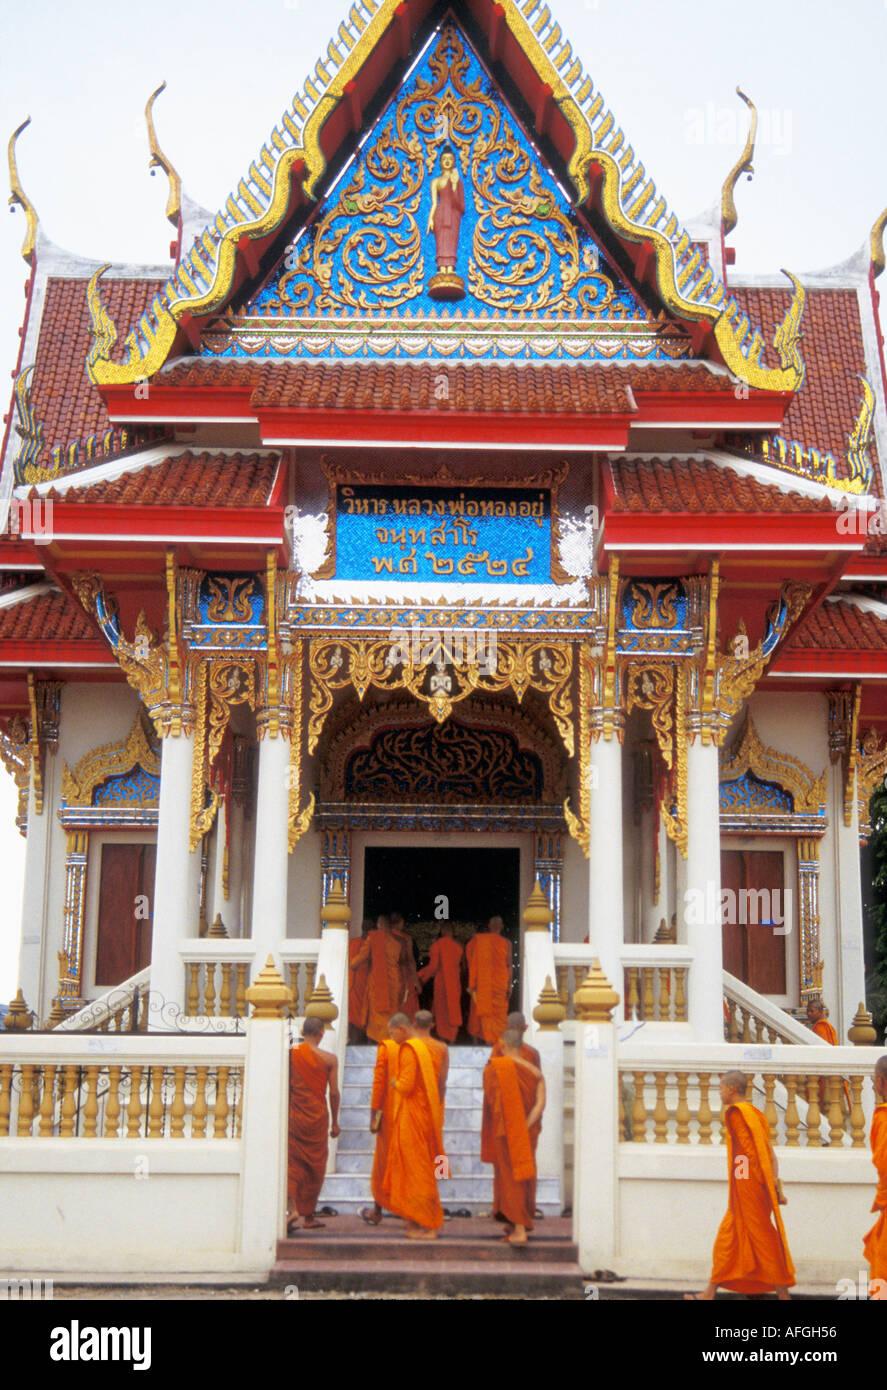 BUDDHISM monks enter a temple for prayers, Bangkok, Thailand - Stock Image